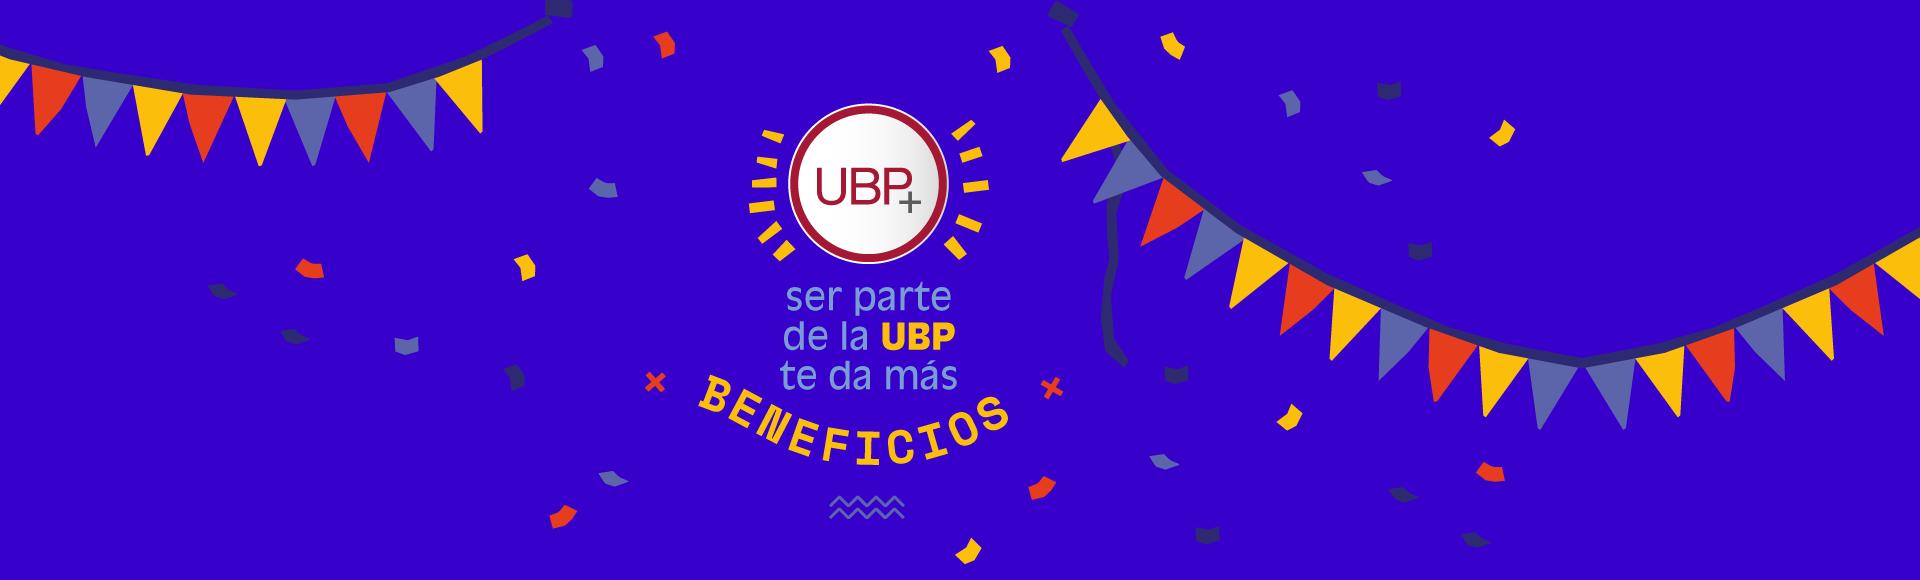 UBP+Beneficios